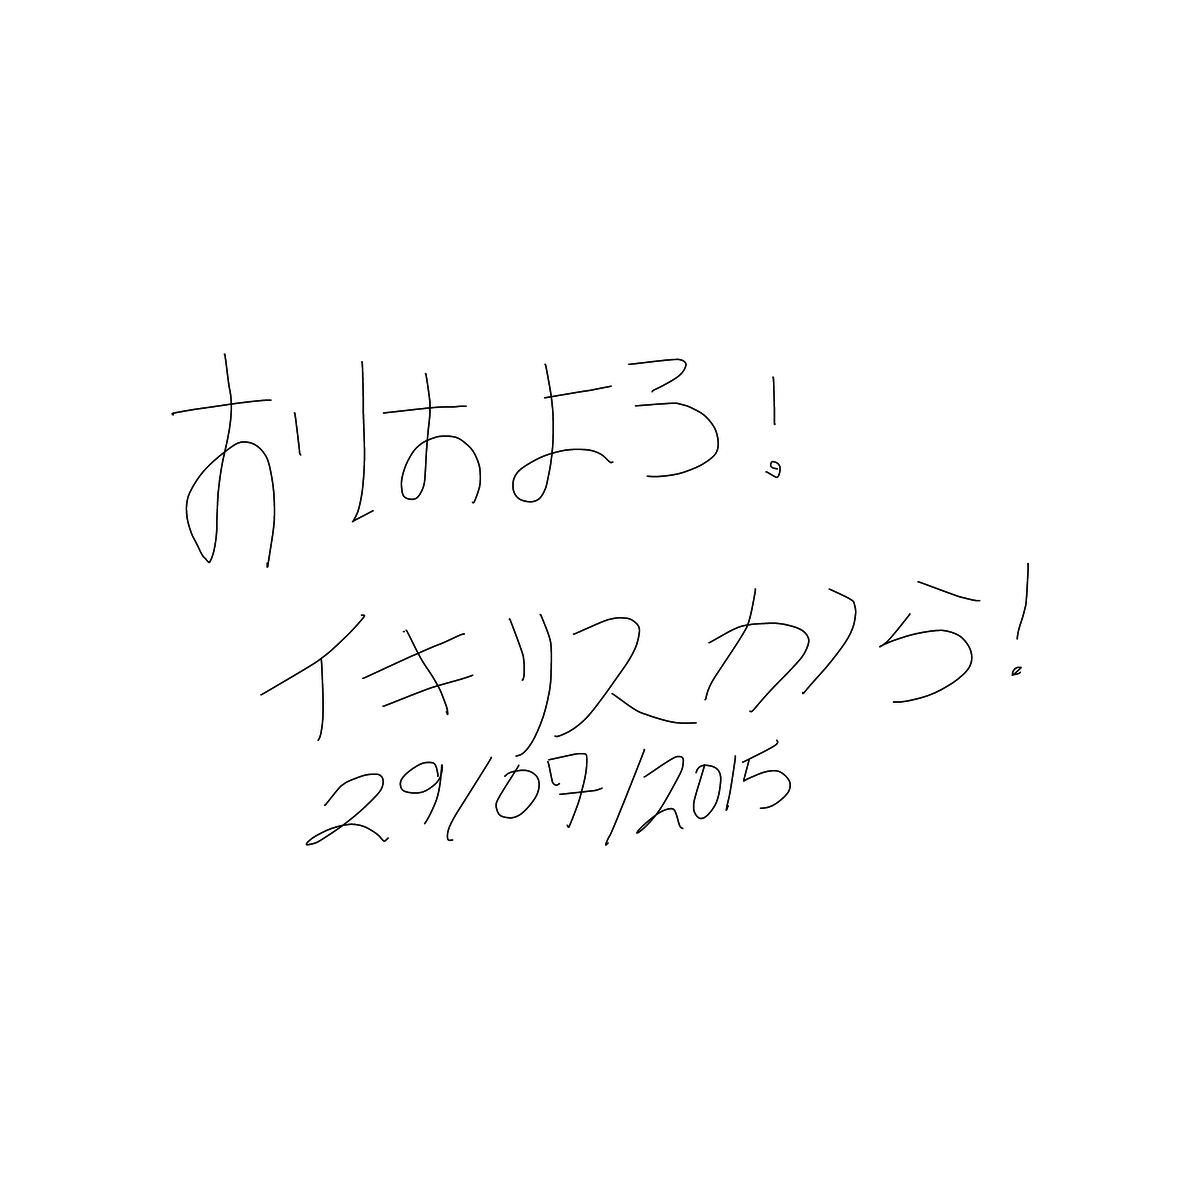 BAAAM drawing#17838 lat:35.6184196472168000lng: 139.5986022949218800